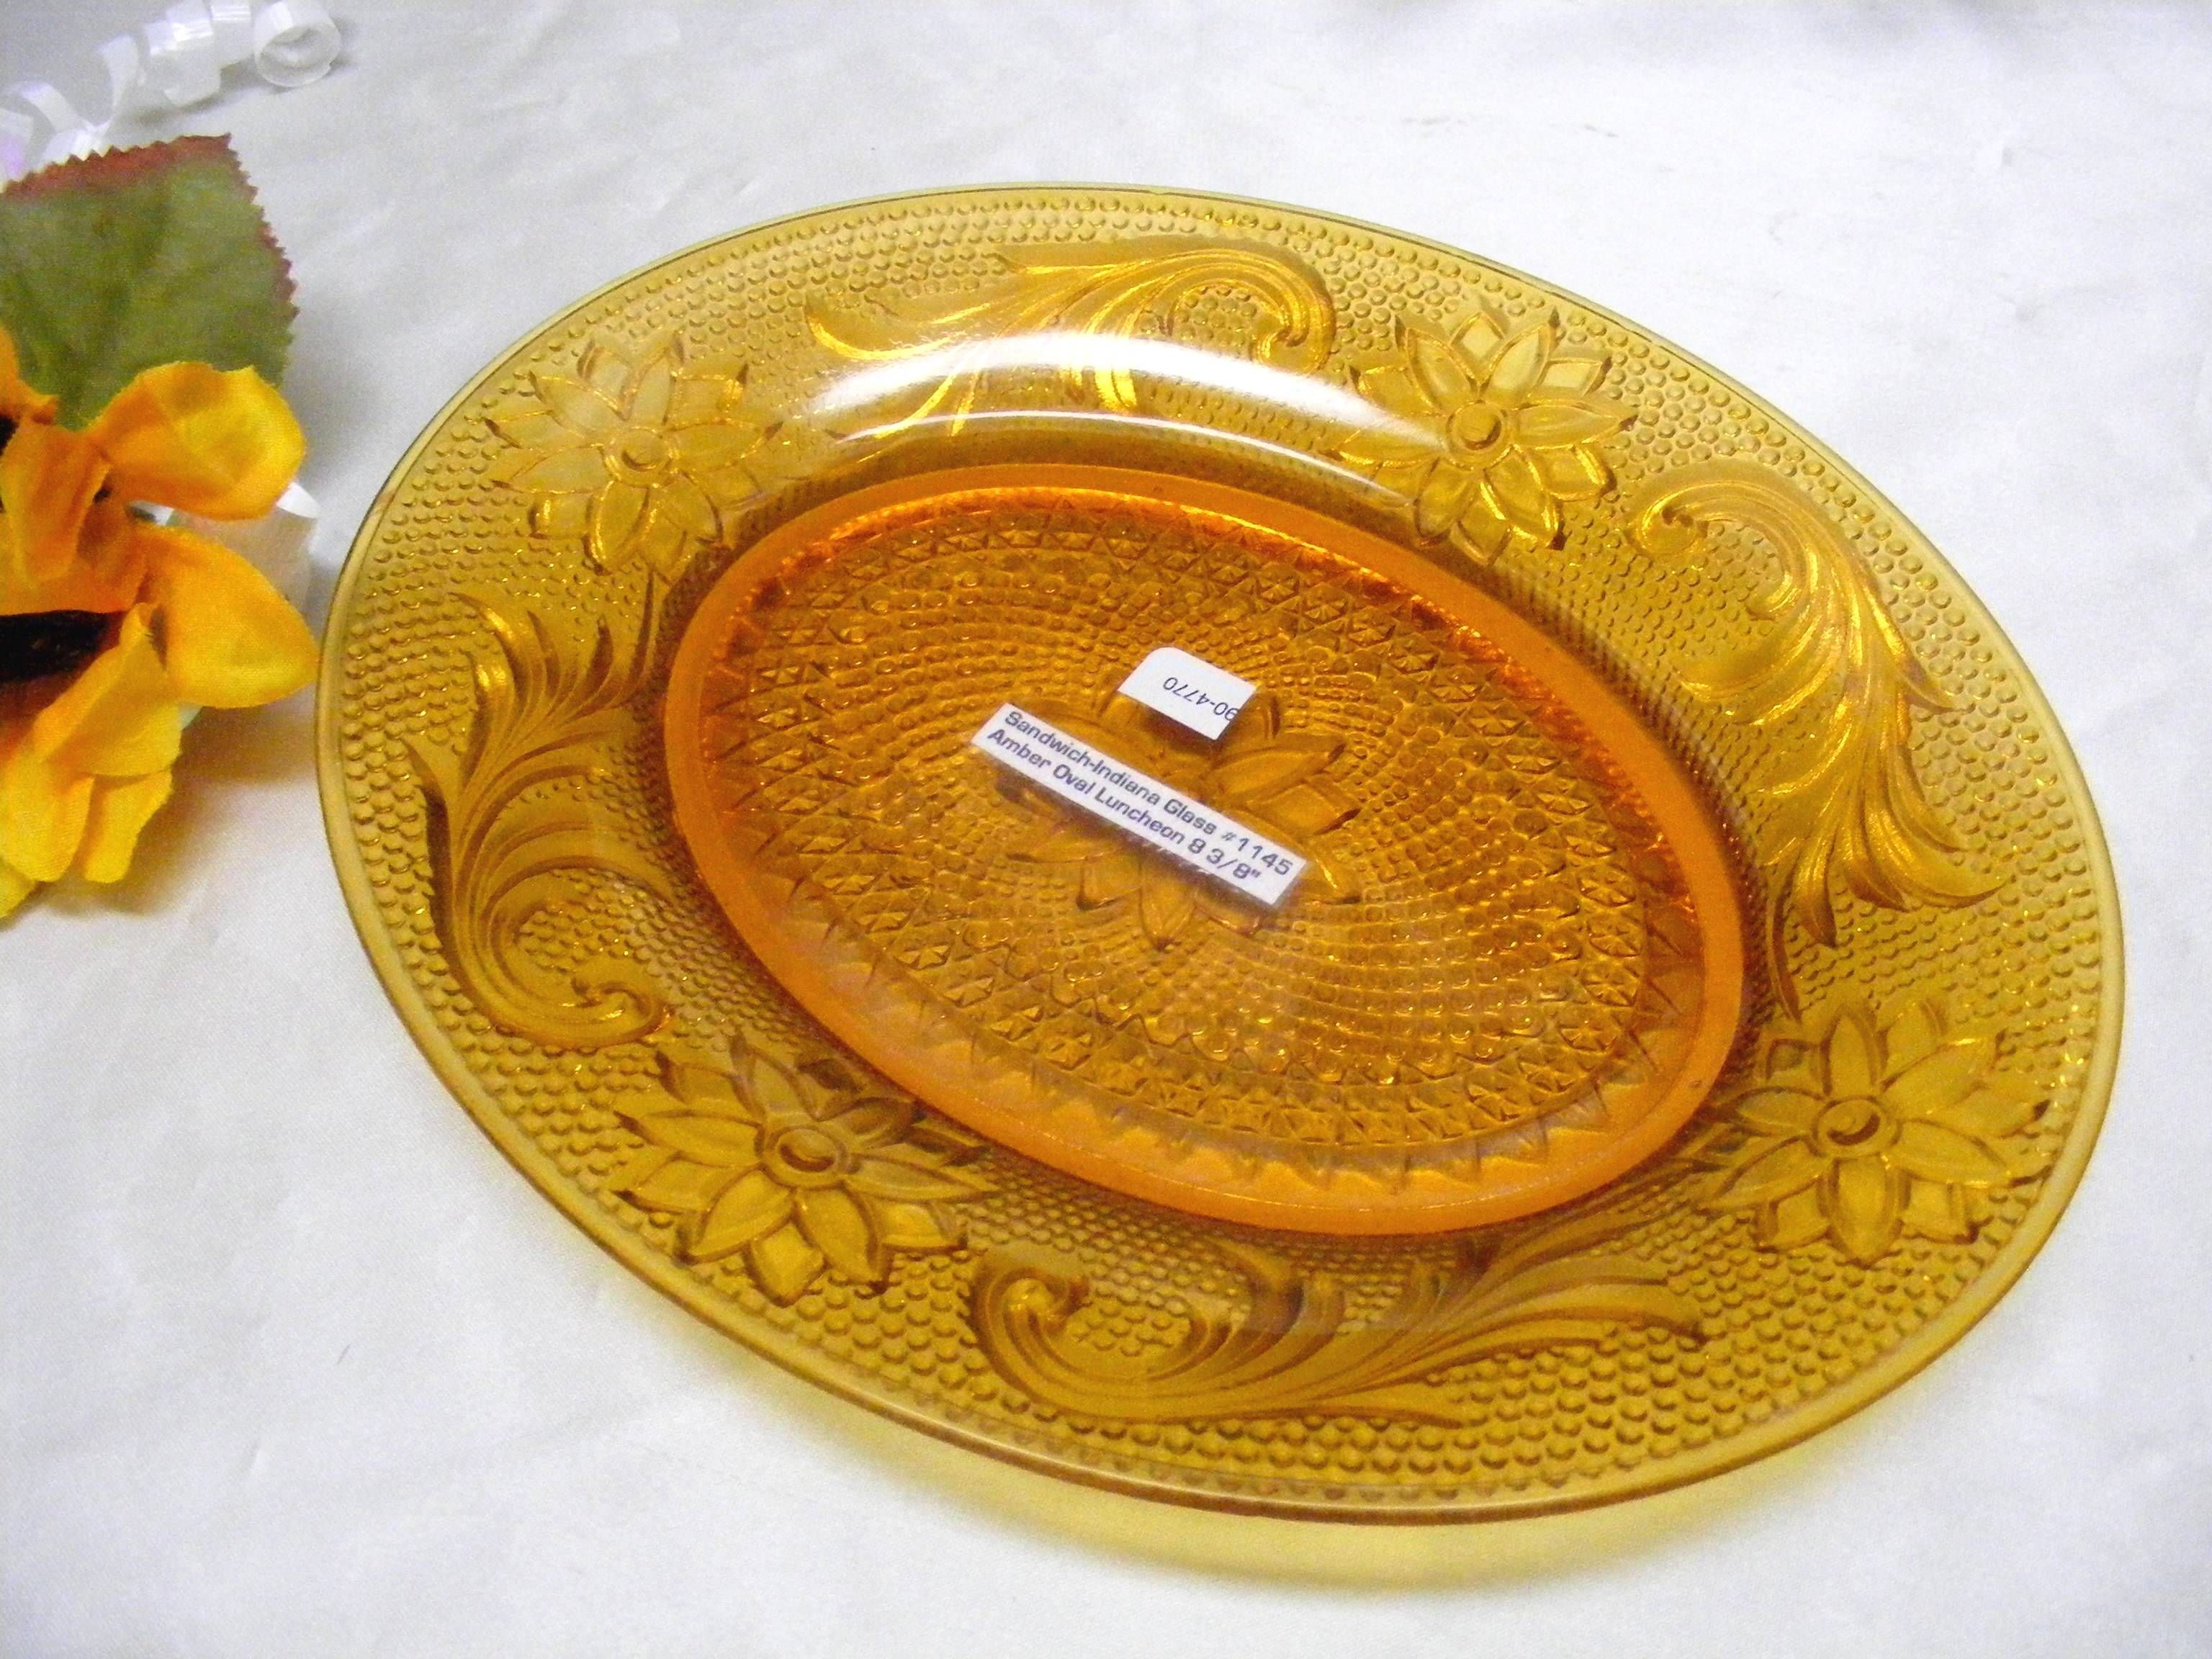 Vintage Tiara Chantilly Sandwich Luncheon or Dessert Plate